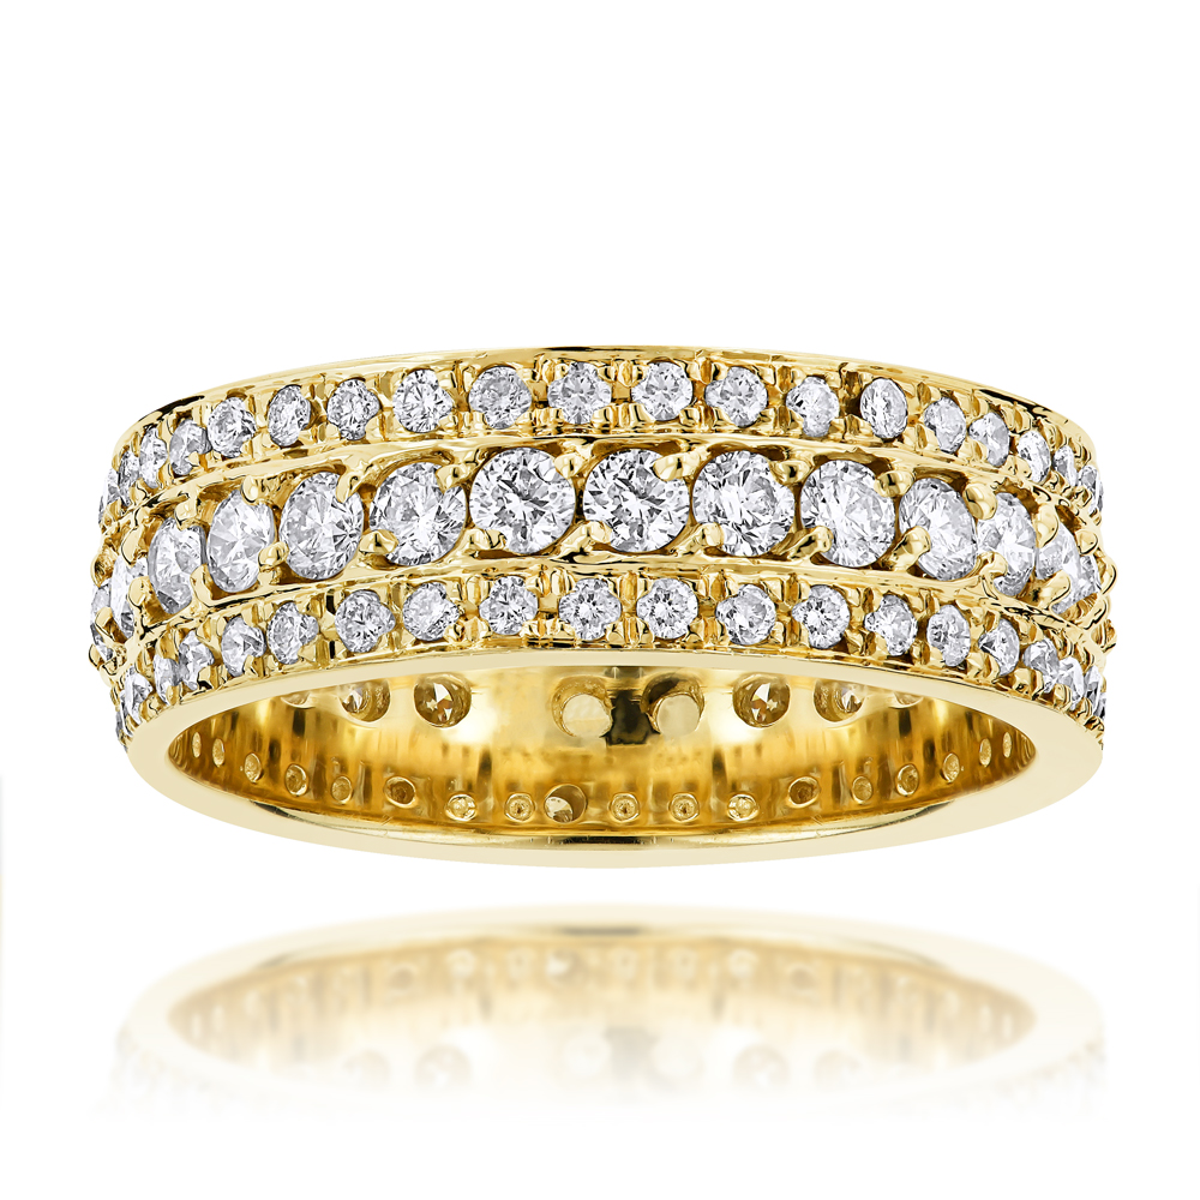 14K Gold Round Diamond Eternity Band 2 Carat Ring by Luxurman